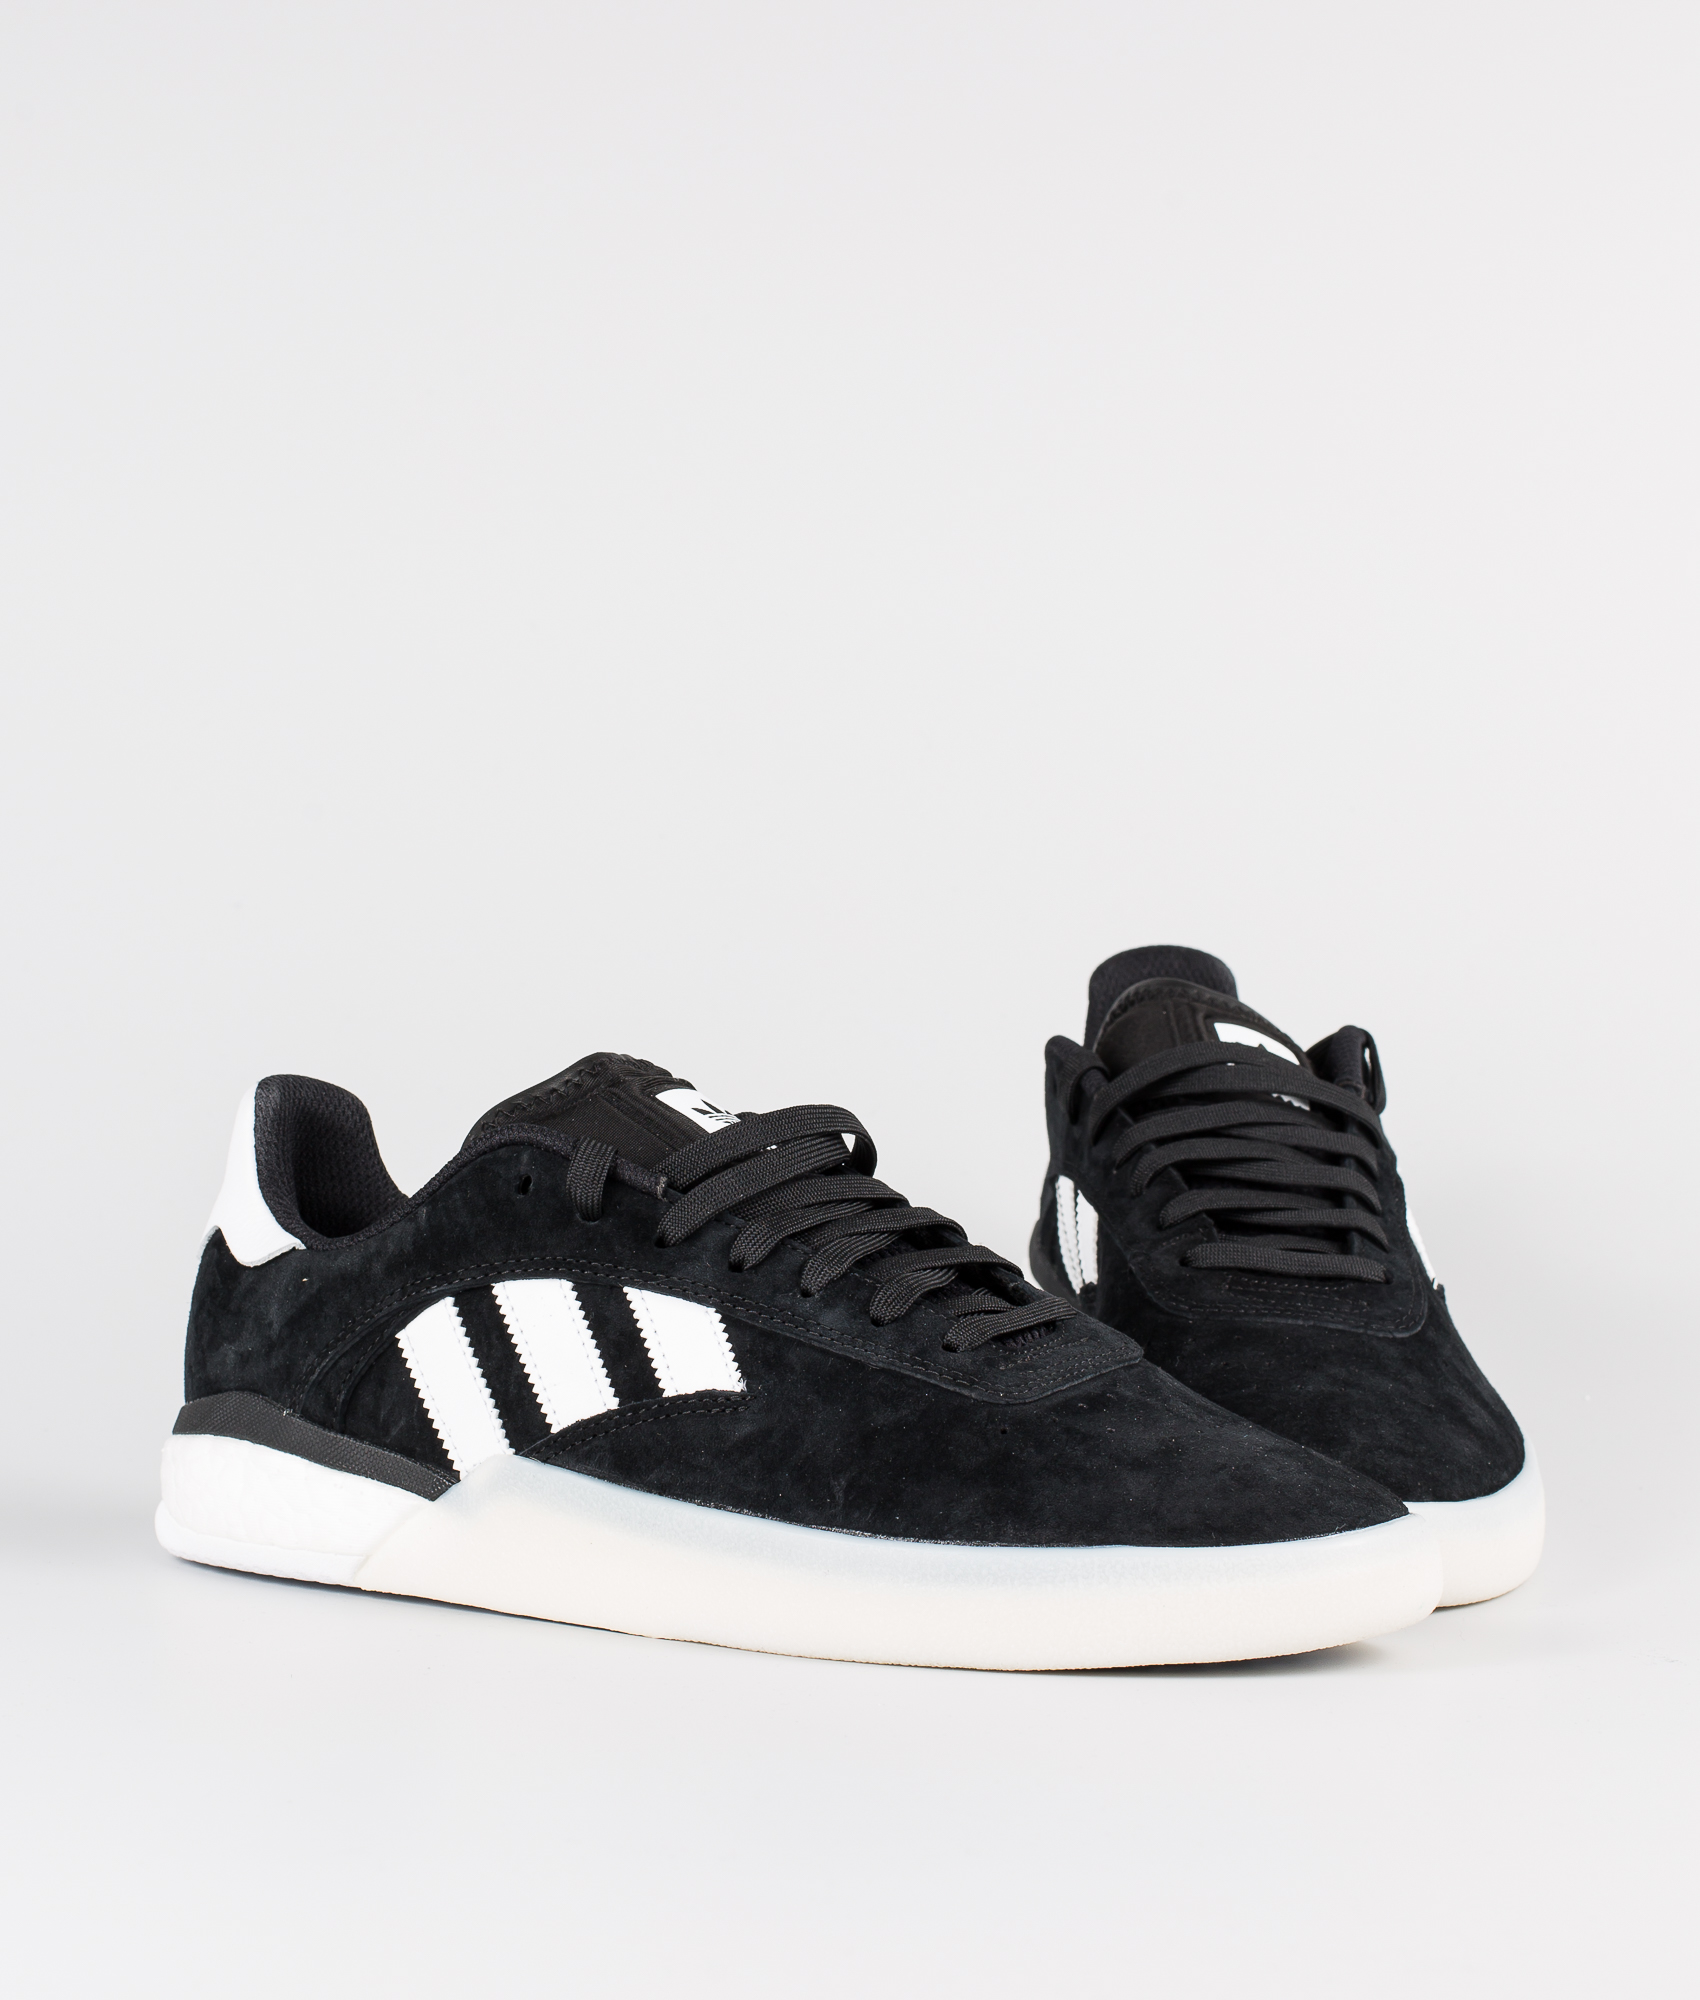 Adidas Skateboarding 3St.004 Sko Core BlackFtwr WhiteCore Black